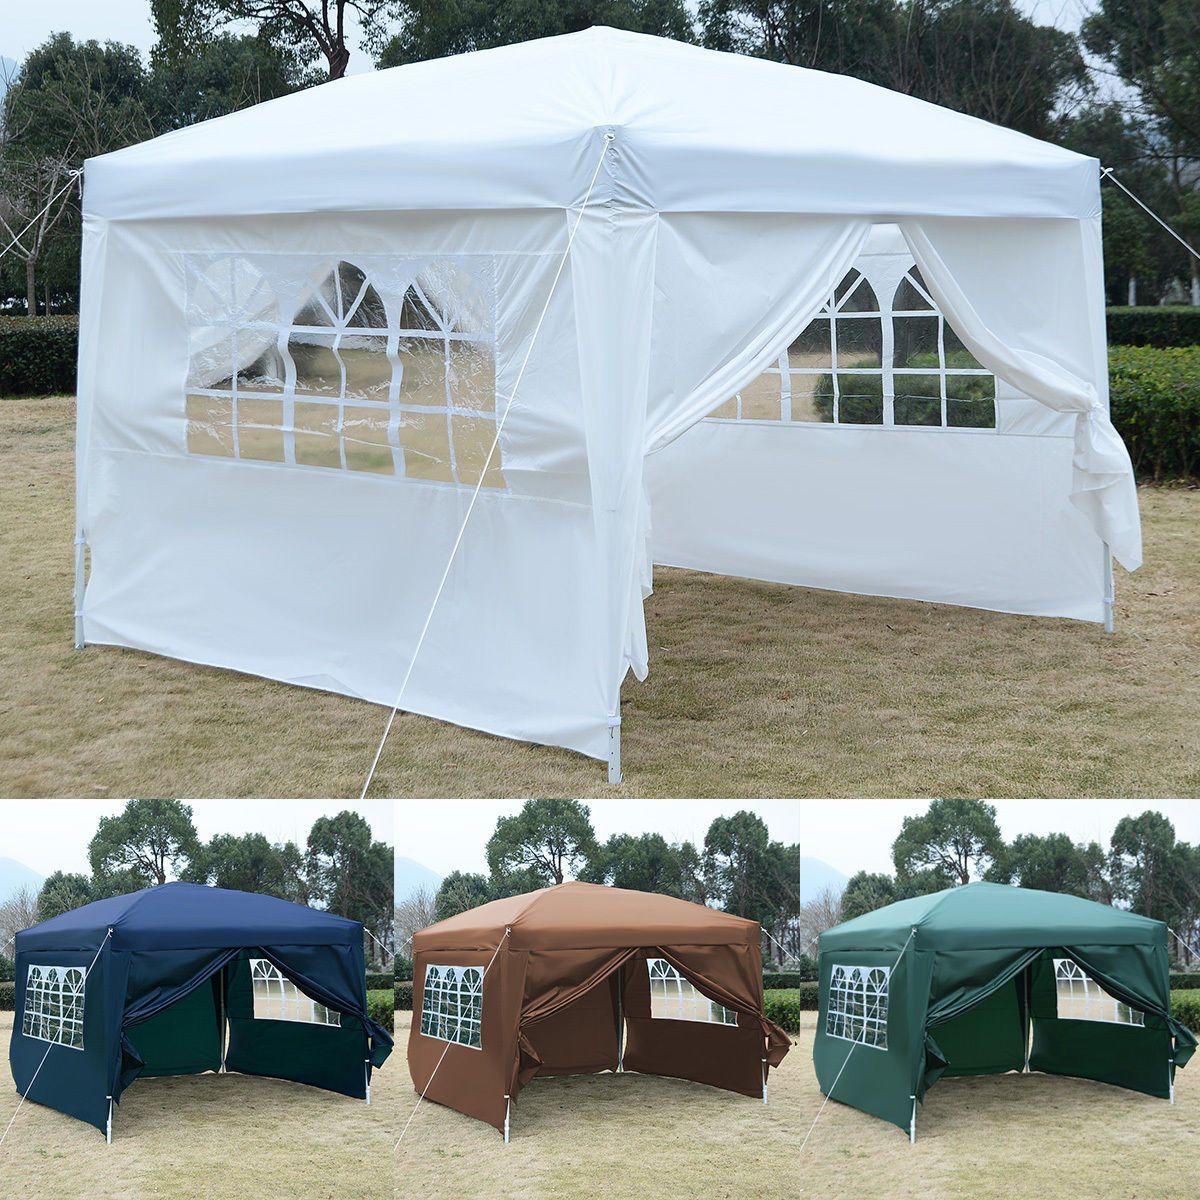 Costway 10u0027X10u0027 EZ POP UP Tent Gazebo Wedding Party Canopy Shelter Carry Bag & Costway 10u0027X10u0027 EZ POP UP Tent Gazebo Wedding Party Canopy Shelter ...